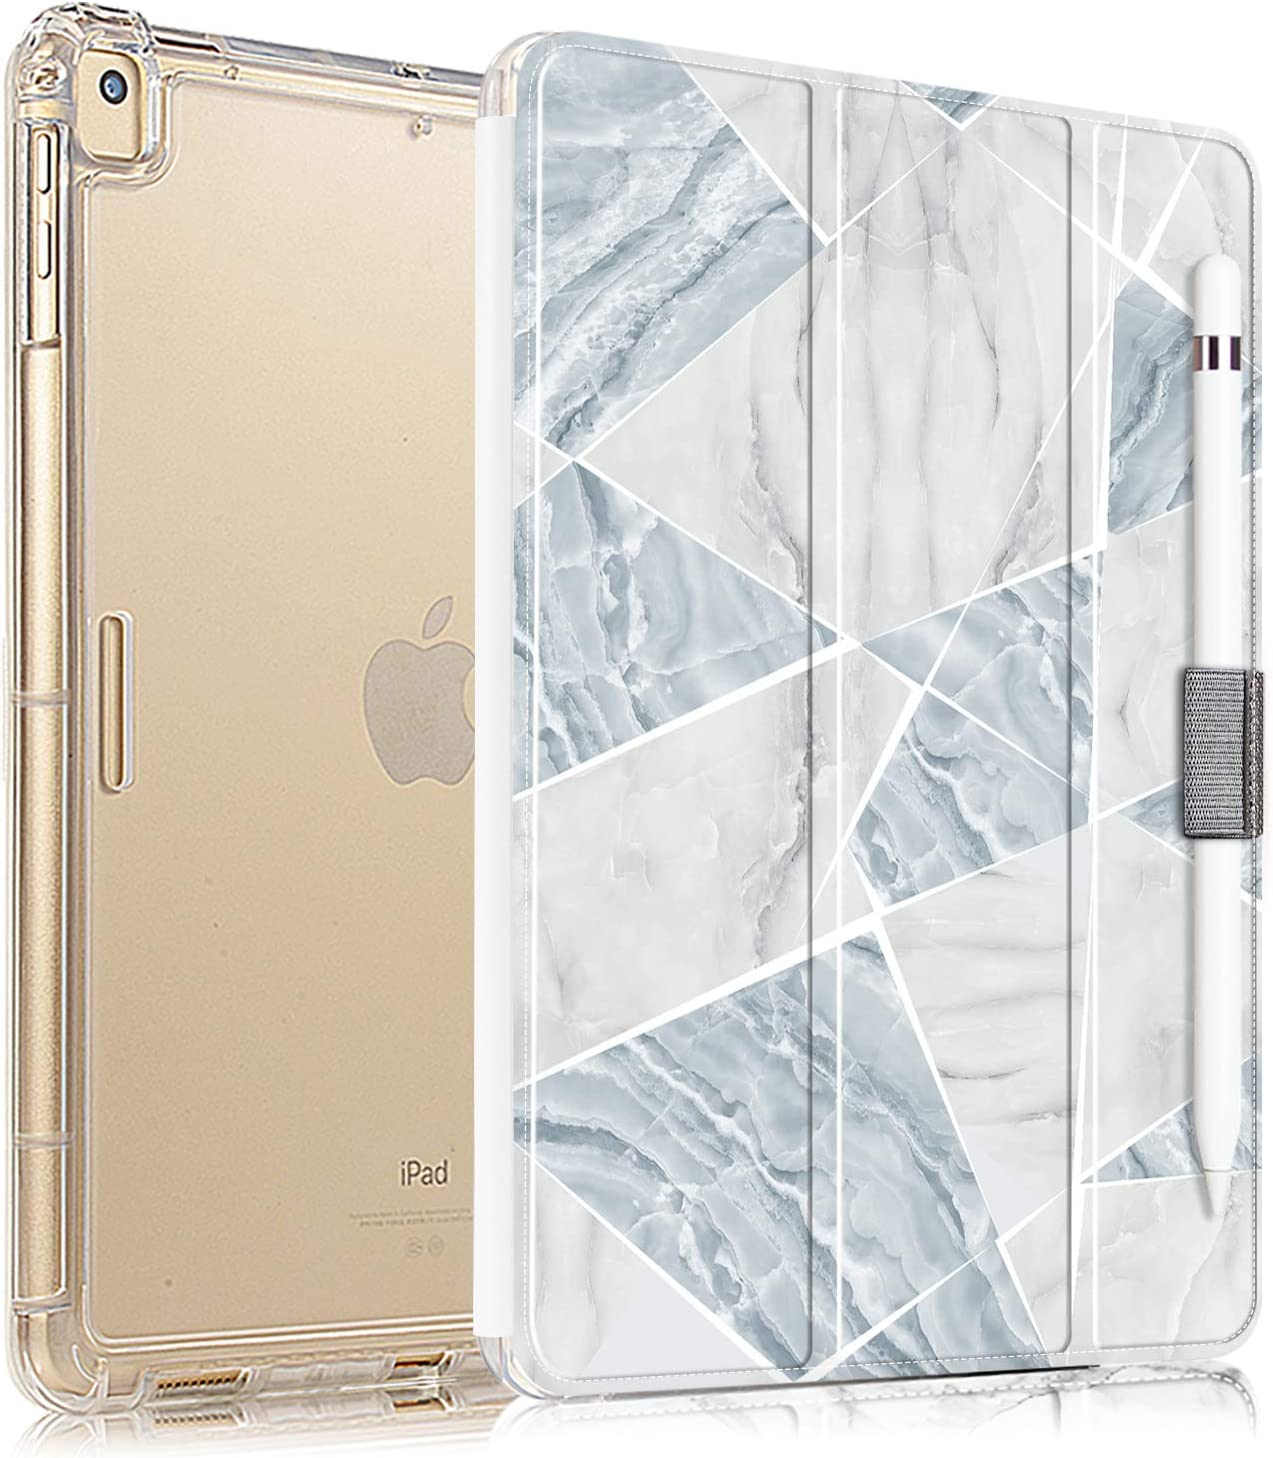 Valkit iPad Mini 5th Generation 2019 Case, iPad Mini 4 Case,Translucent Frosted Back Protective Smart Cover for 2019 Apple iPad Mini 5 7.9 Inch [with Auto Sleep/Wake], Blue Marble